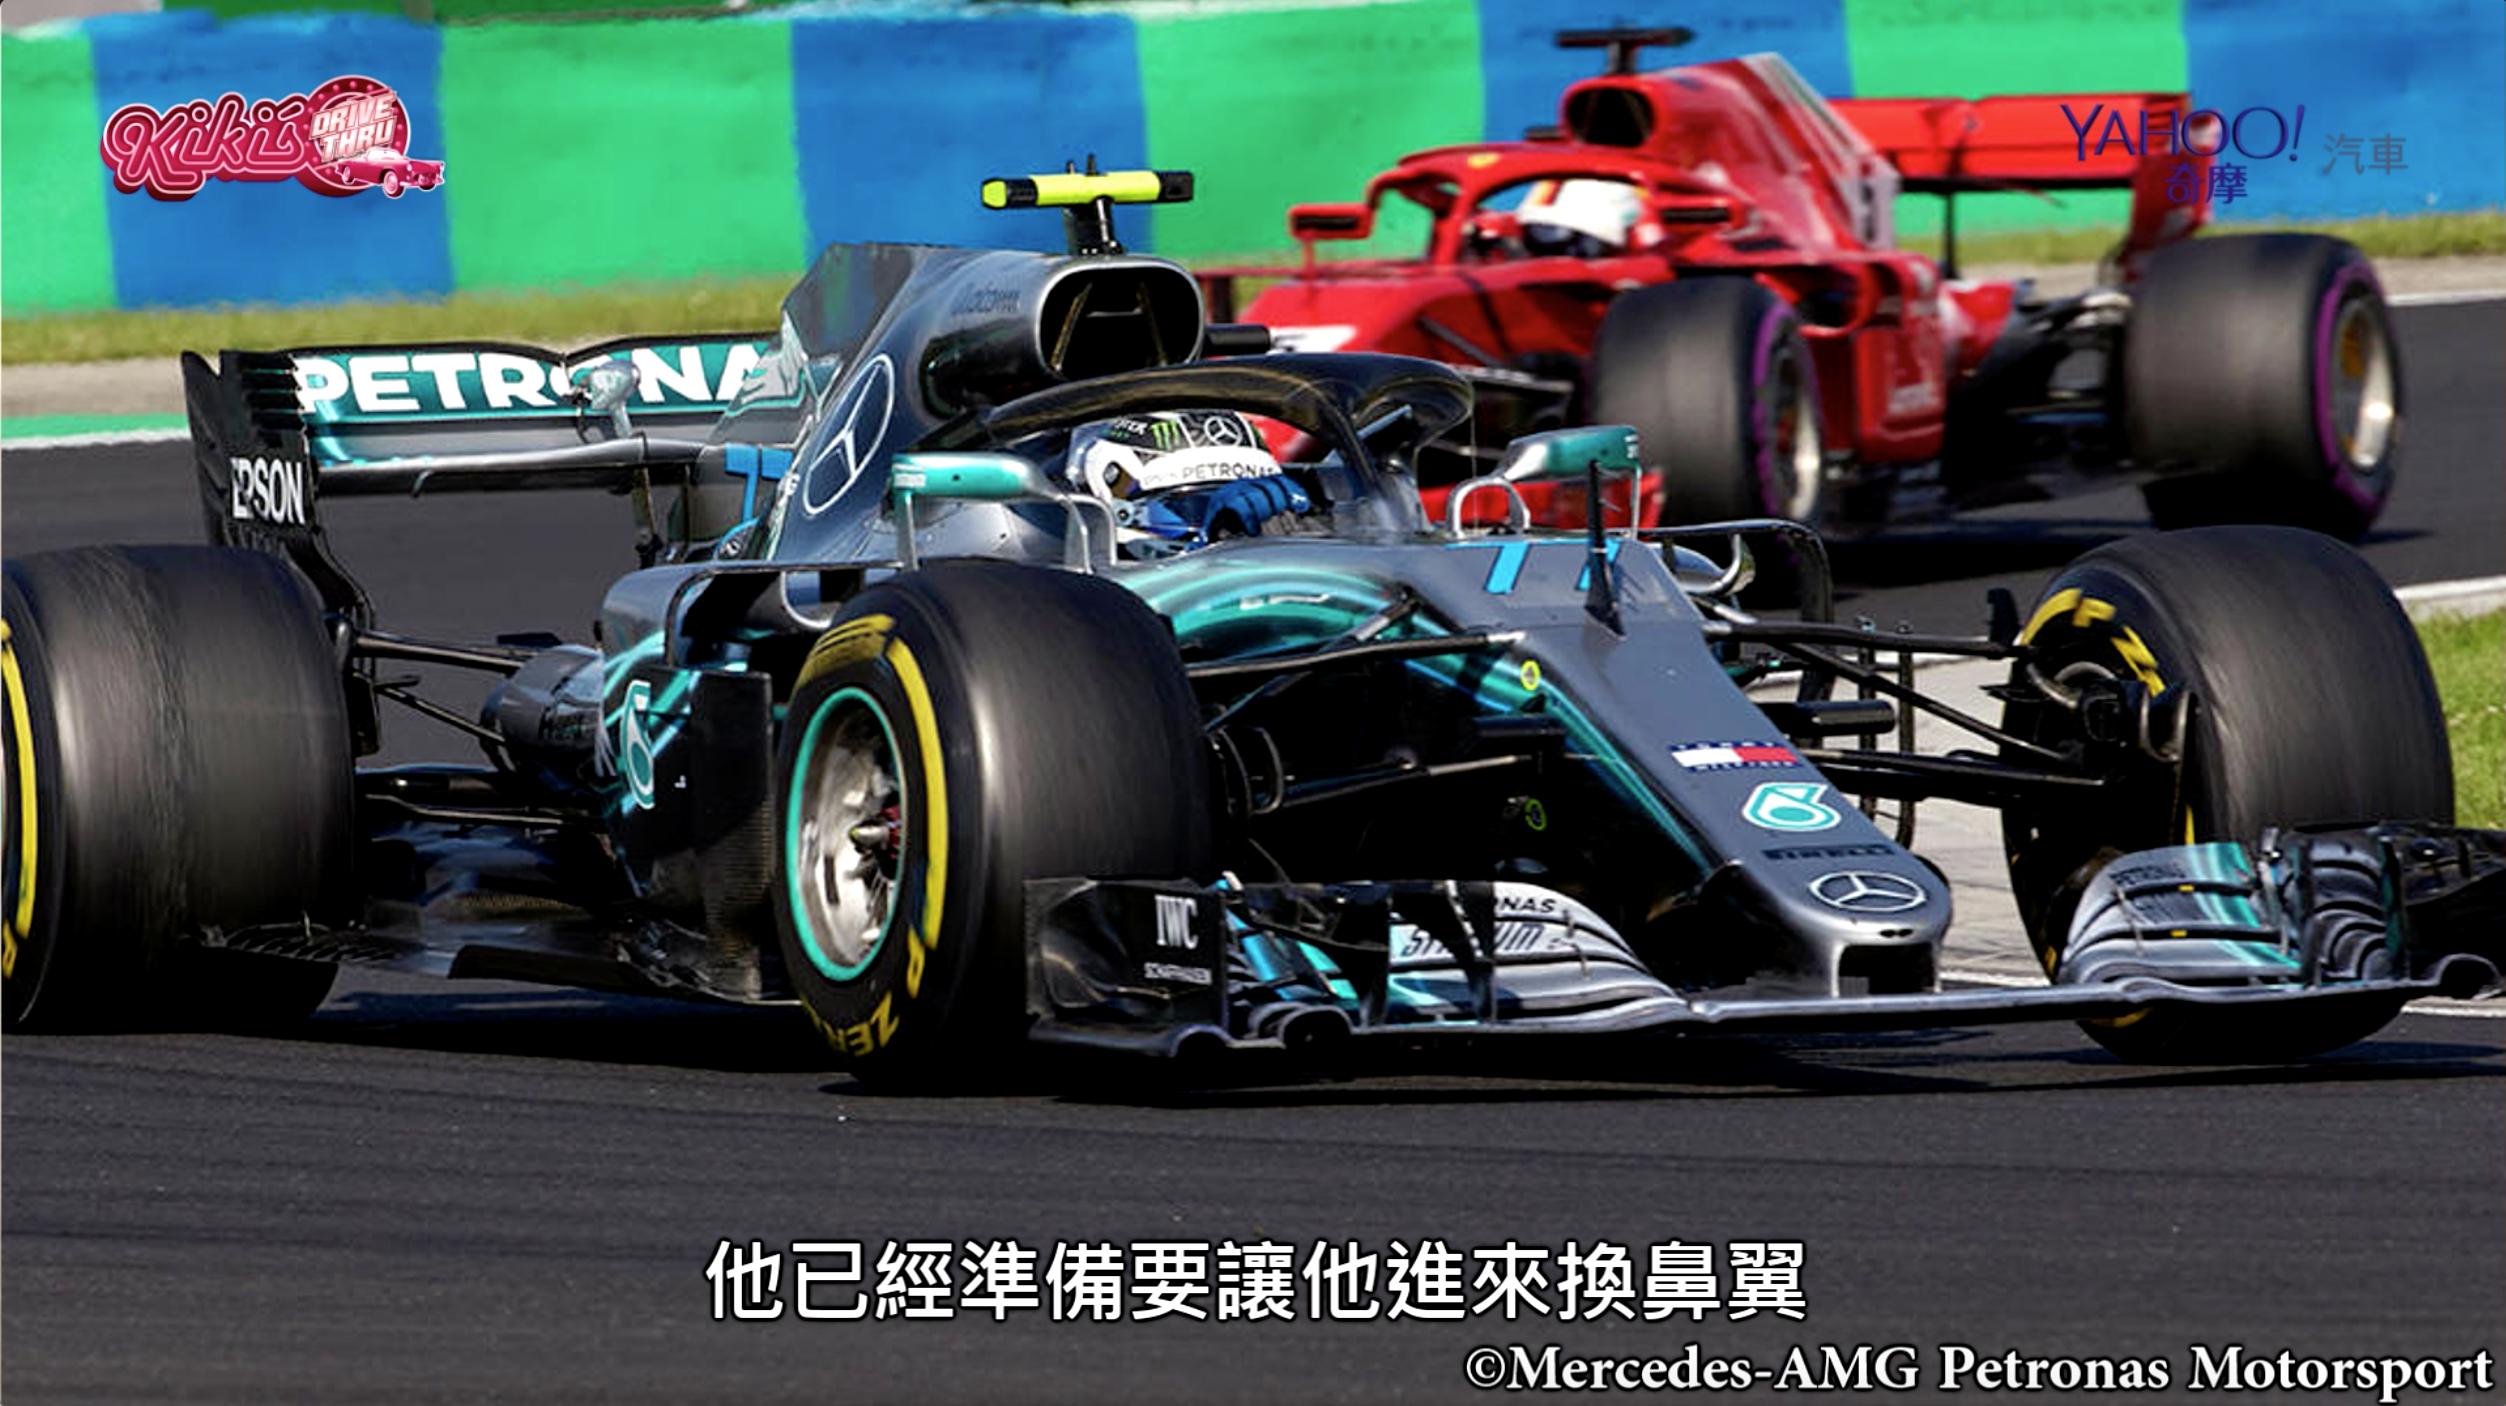 【Kiki's Drive-Thru】Vol.7 淺談F1匈牙利大賽 / 新AMG S63整台撞毀 / 介紹三種汽車相關保險